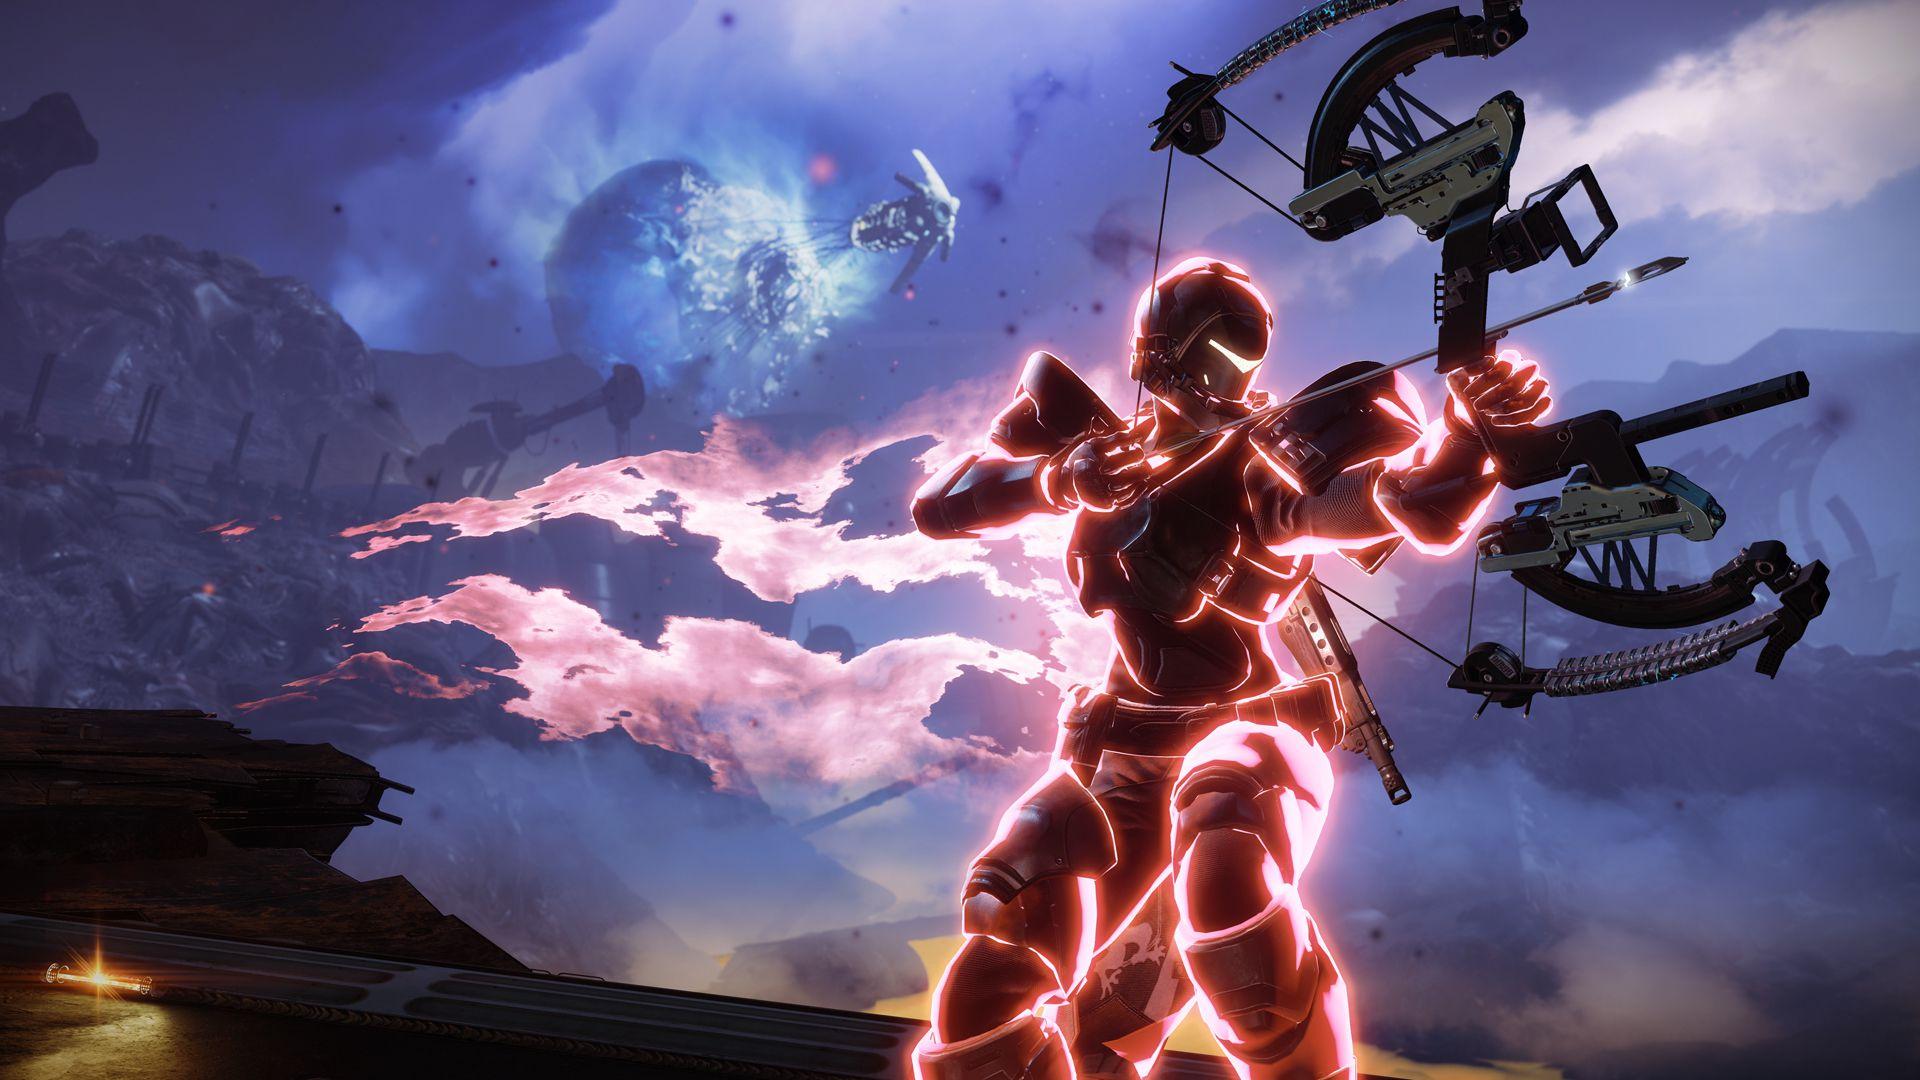 Destiny 2: Wann startet Forsaken? – Genaue Uhrzeit, Server-Downtime